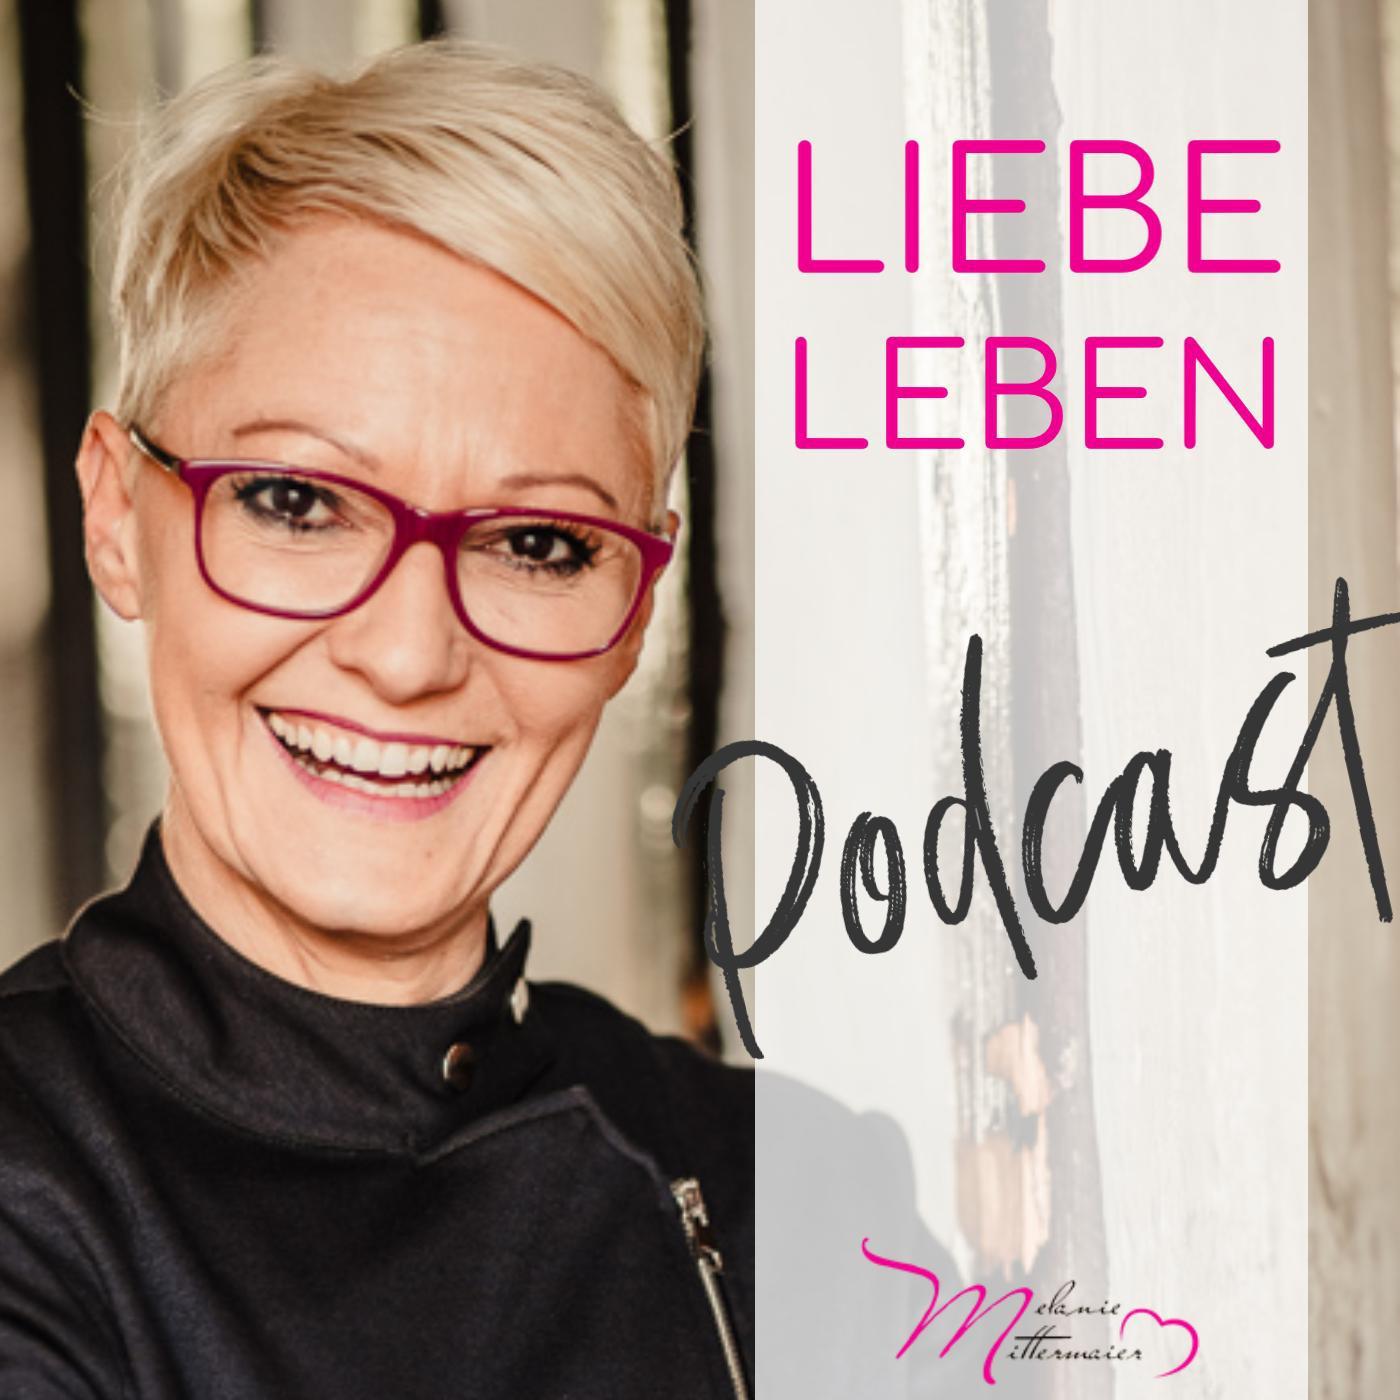 Liebe Leben - Der Podcast - Melanie Mittermaier - Affären-Managerin & Liebes-Coach | Listen Notes